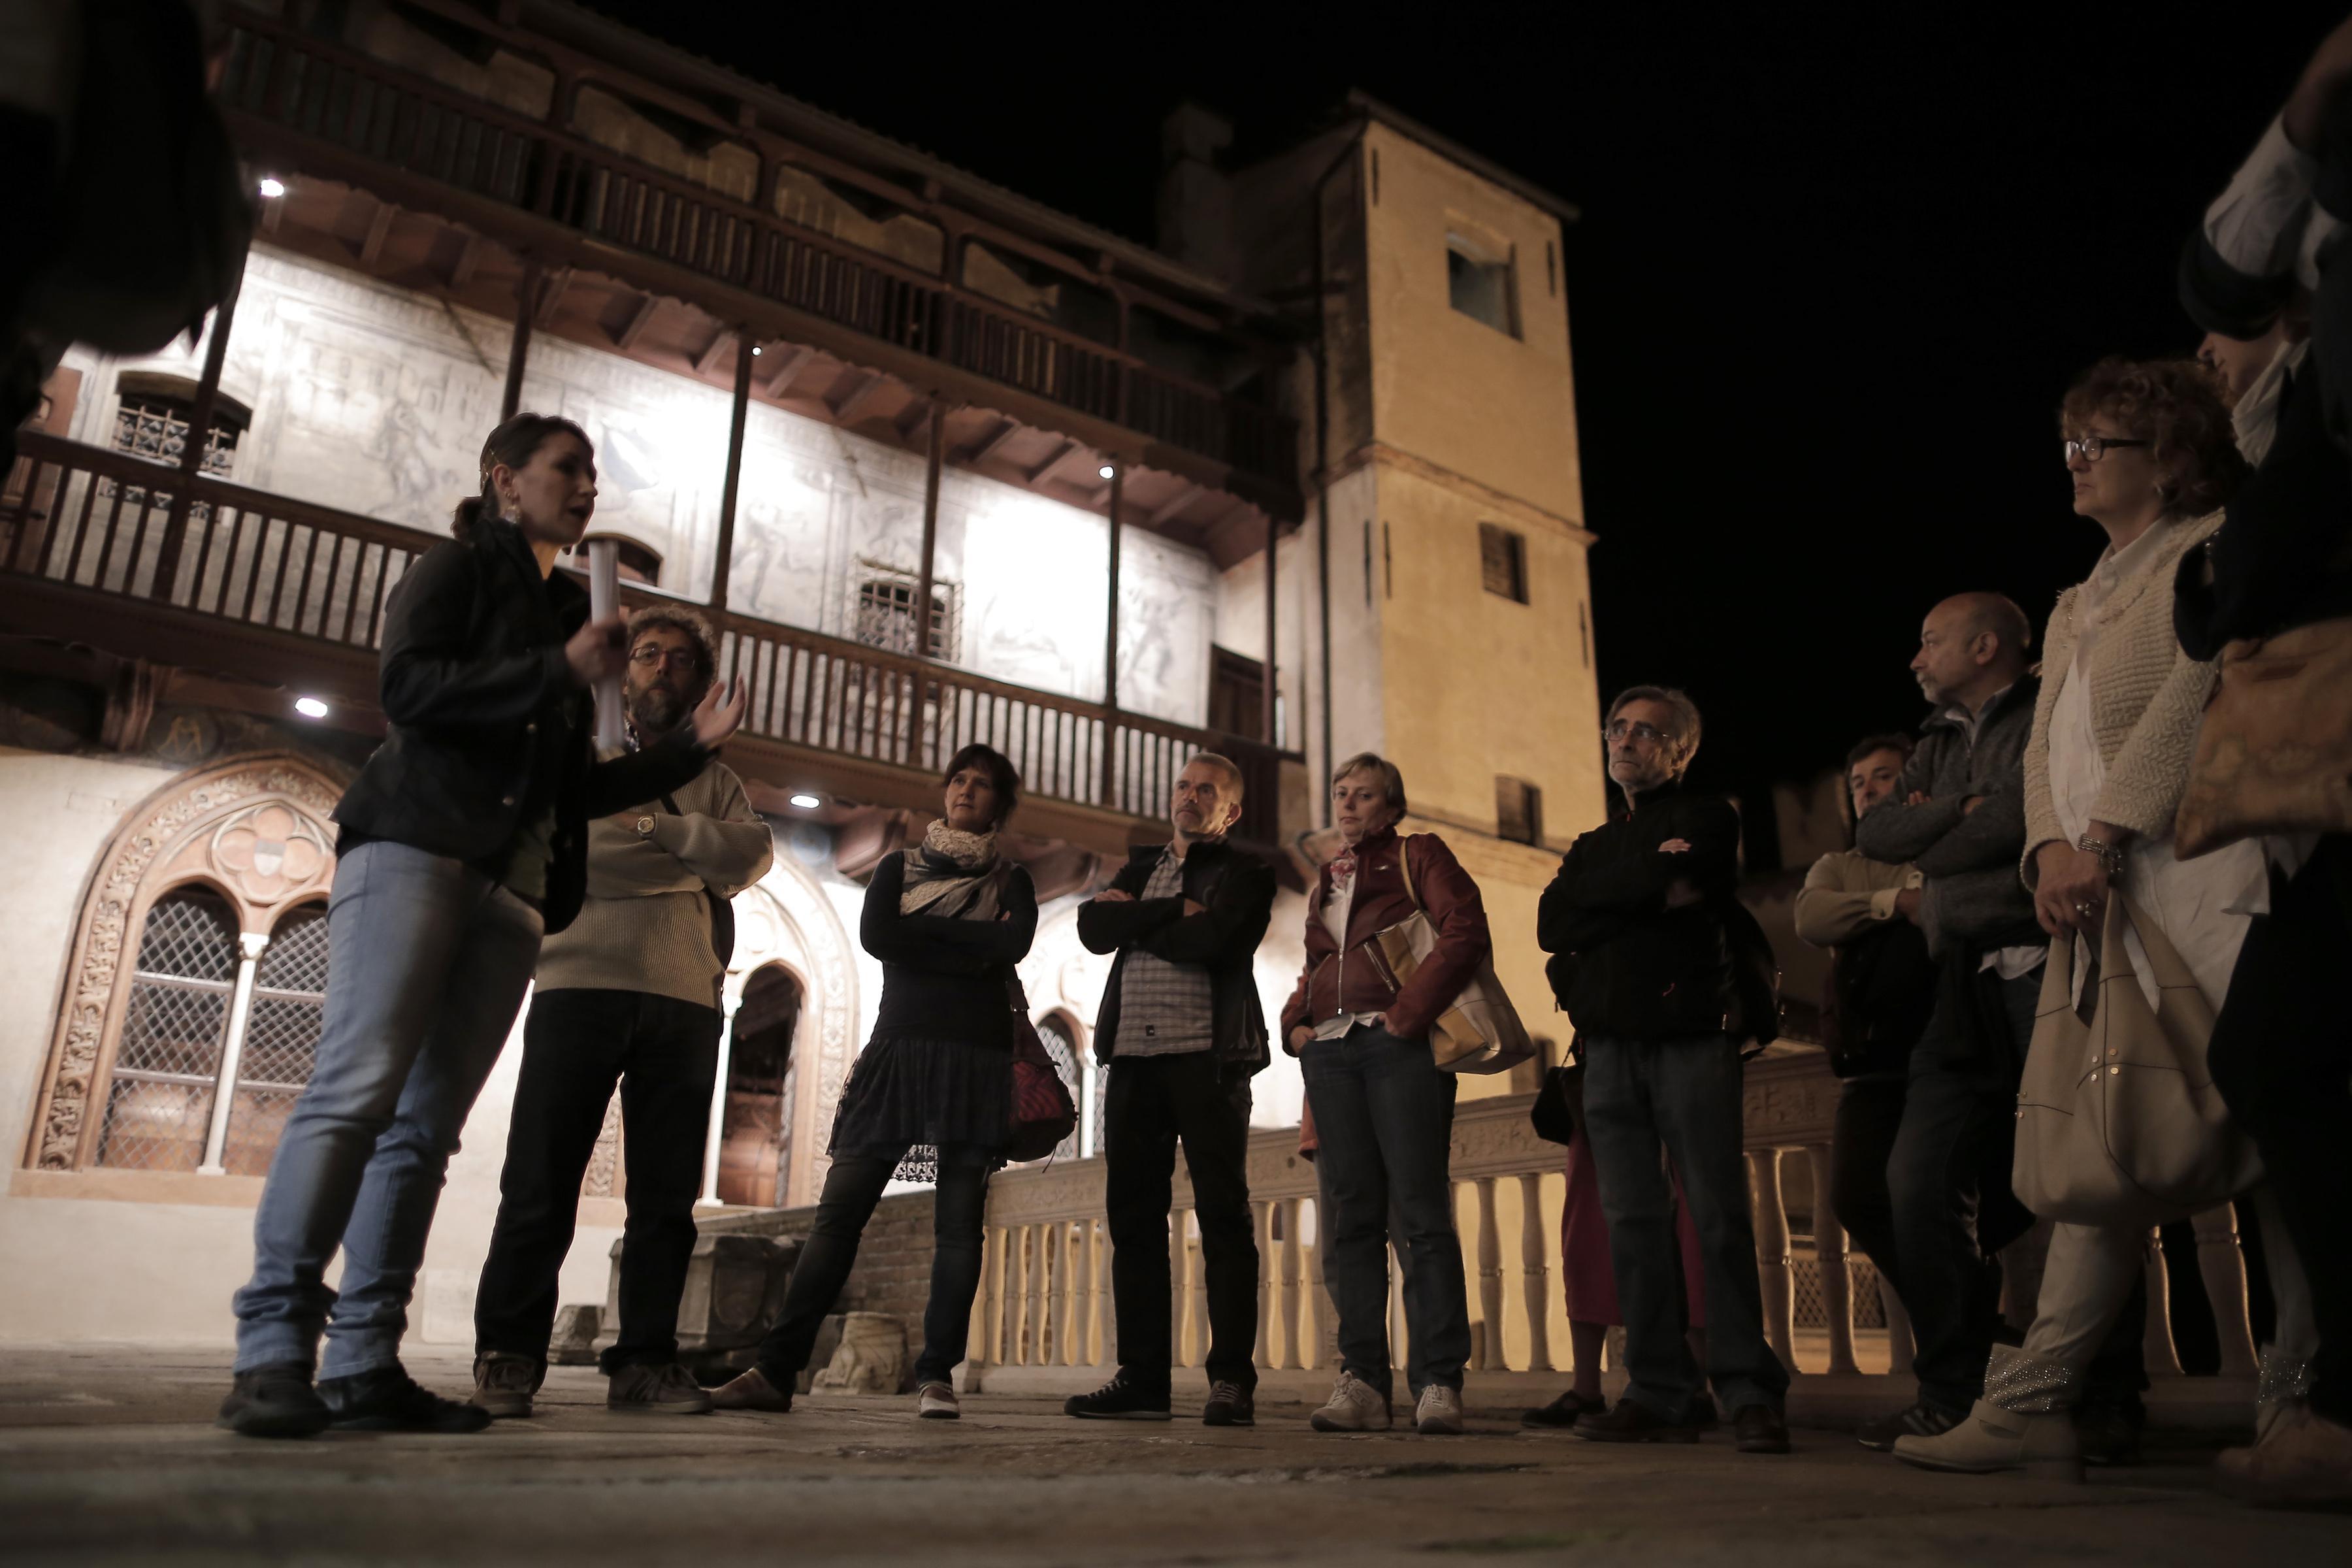 Saluzzo - Notte bianca 2014